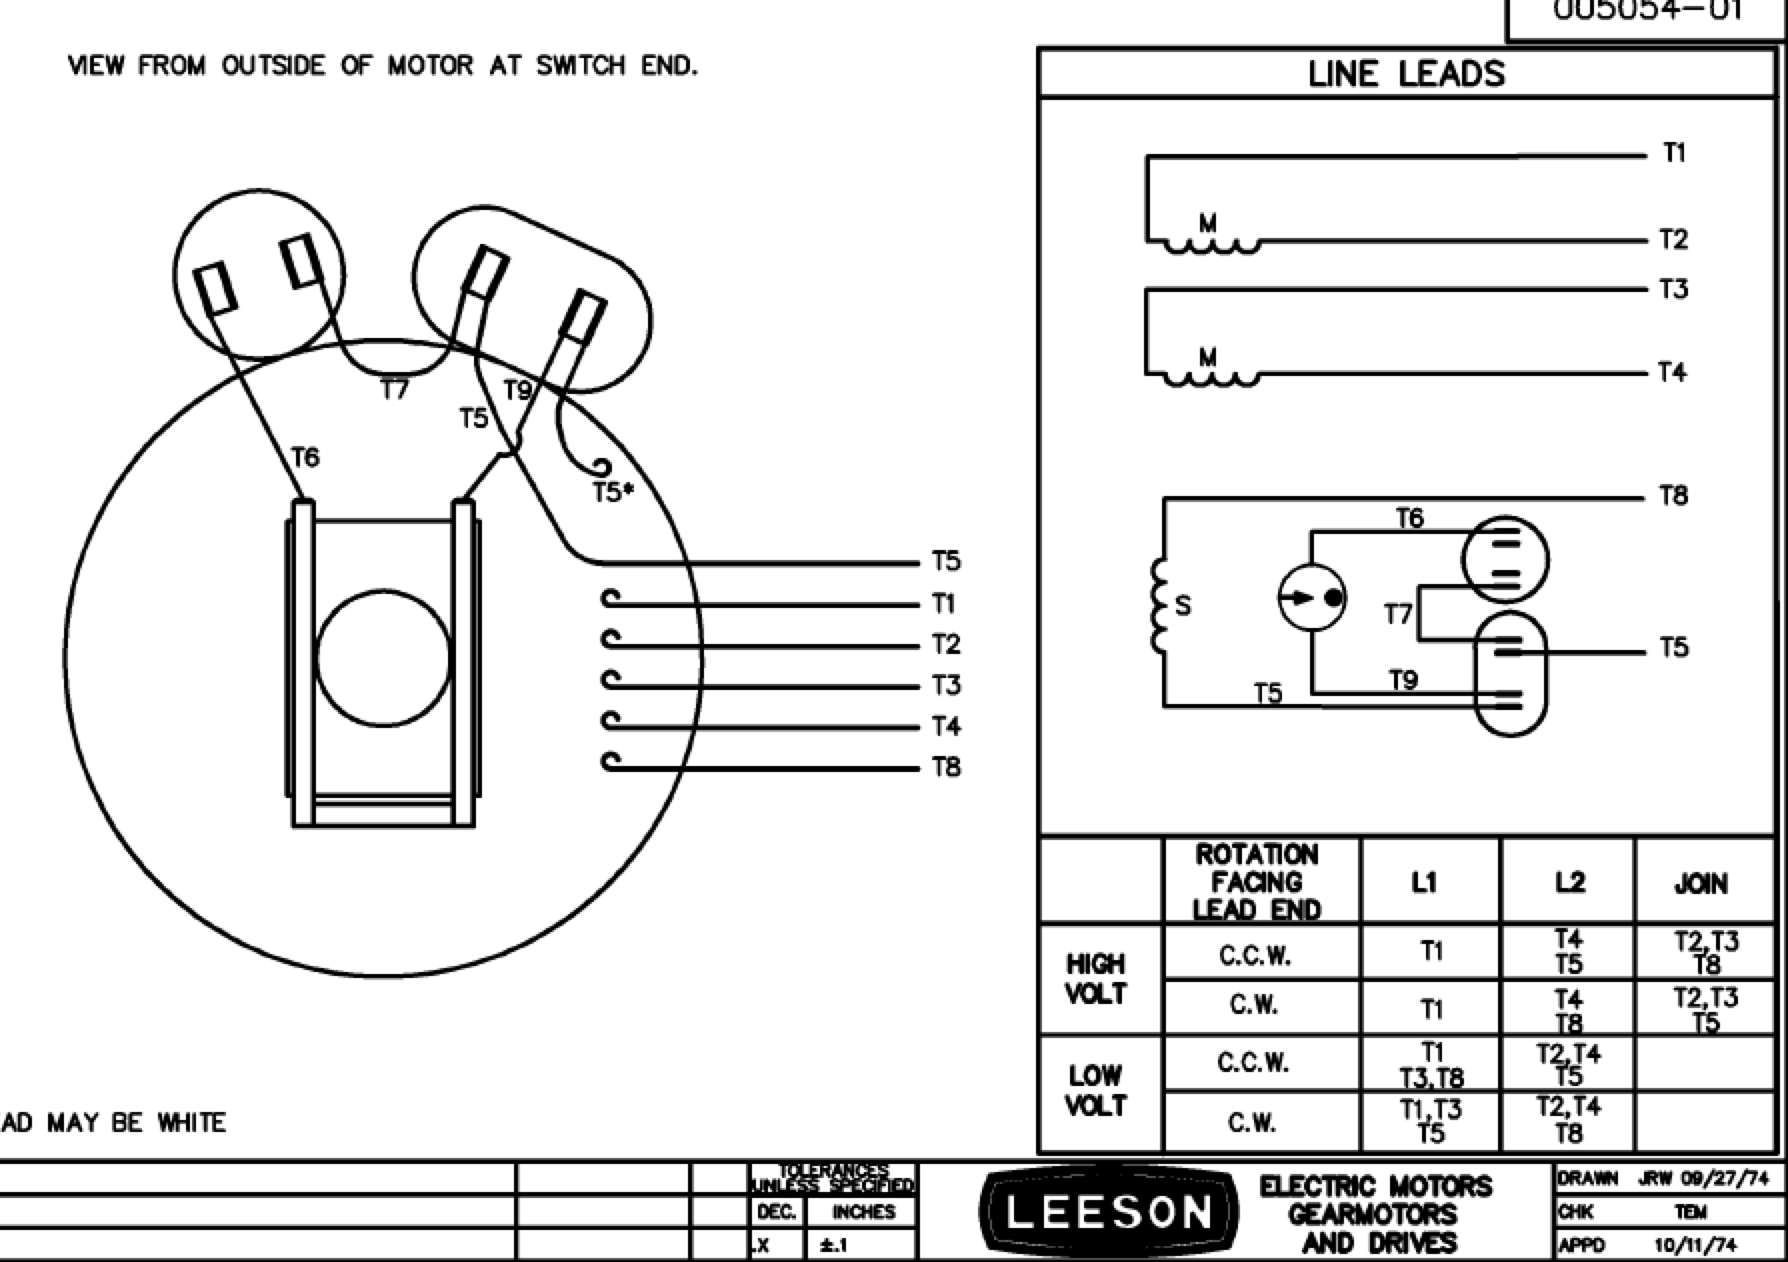 Wiring Diagram Electrical Wiring Diagram Electrical Helloo Car Audio Diagram Electrical Diagram